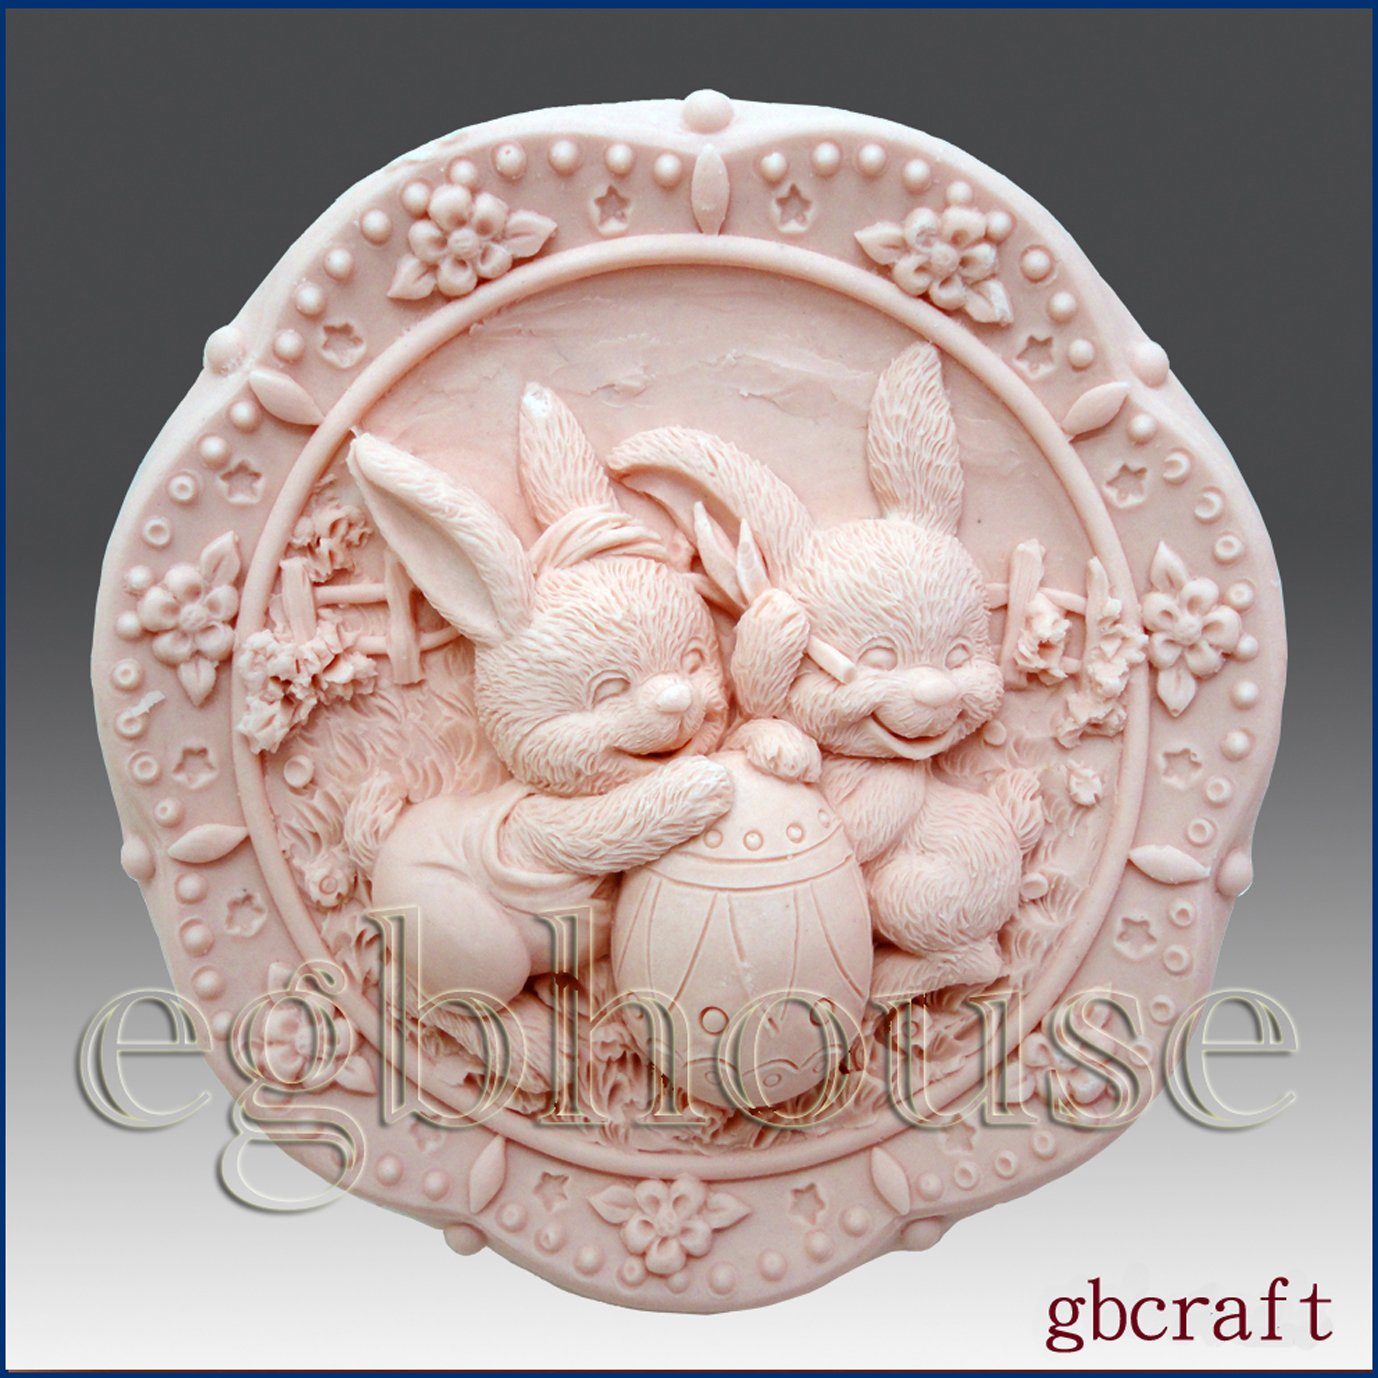 Sunnyside conejitos y huevos - 2d jabón/vela/polímero/arcilla/porcelana fría moldes de silicona (: Amazon.es: Hogar